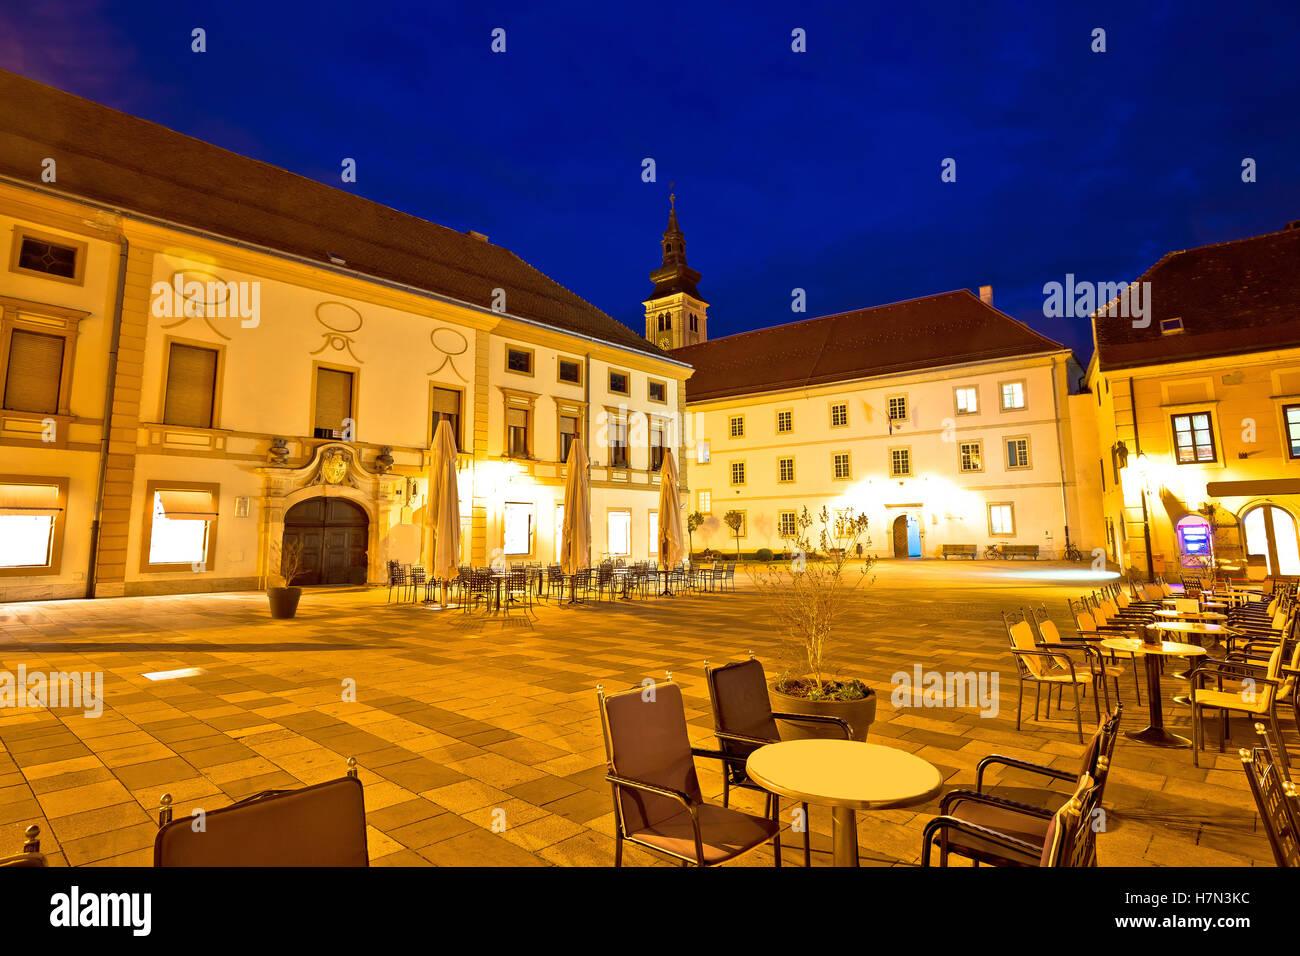 Varazdin barocken quadratische Abend Blick, Nordkroatien Stockbild